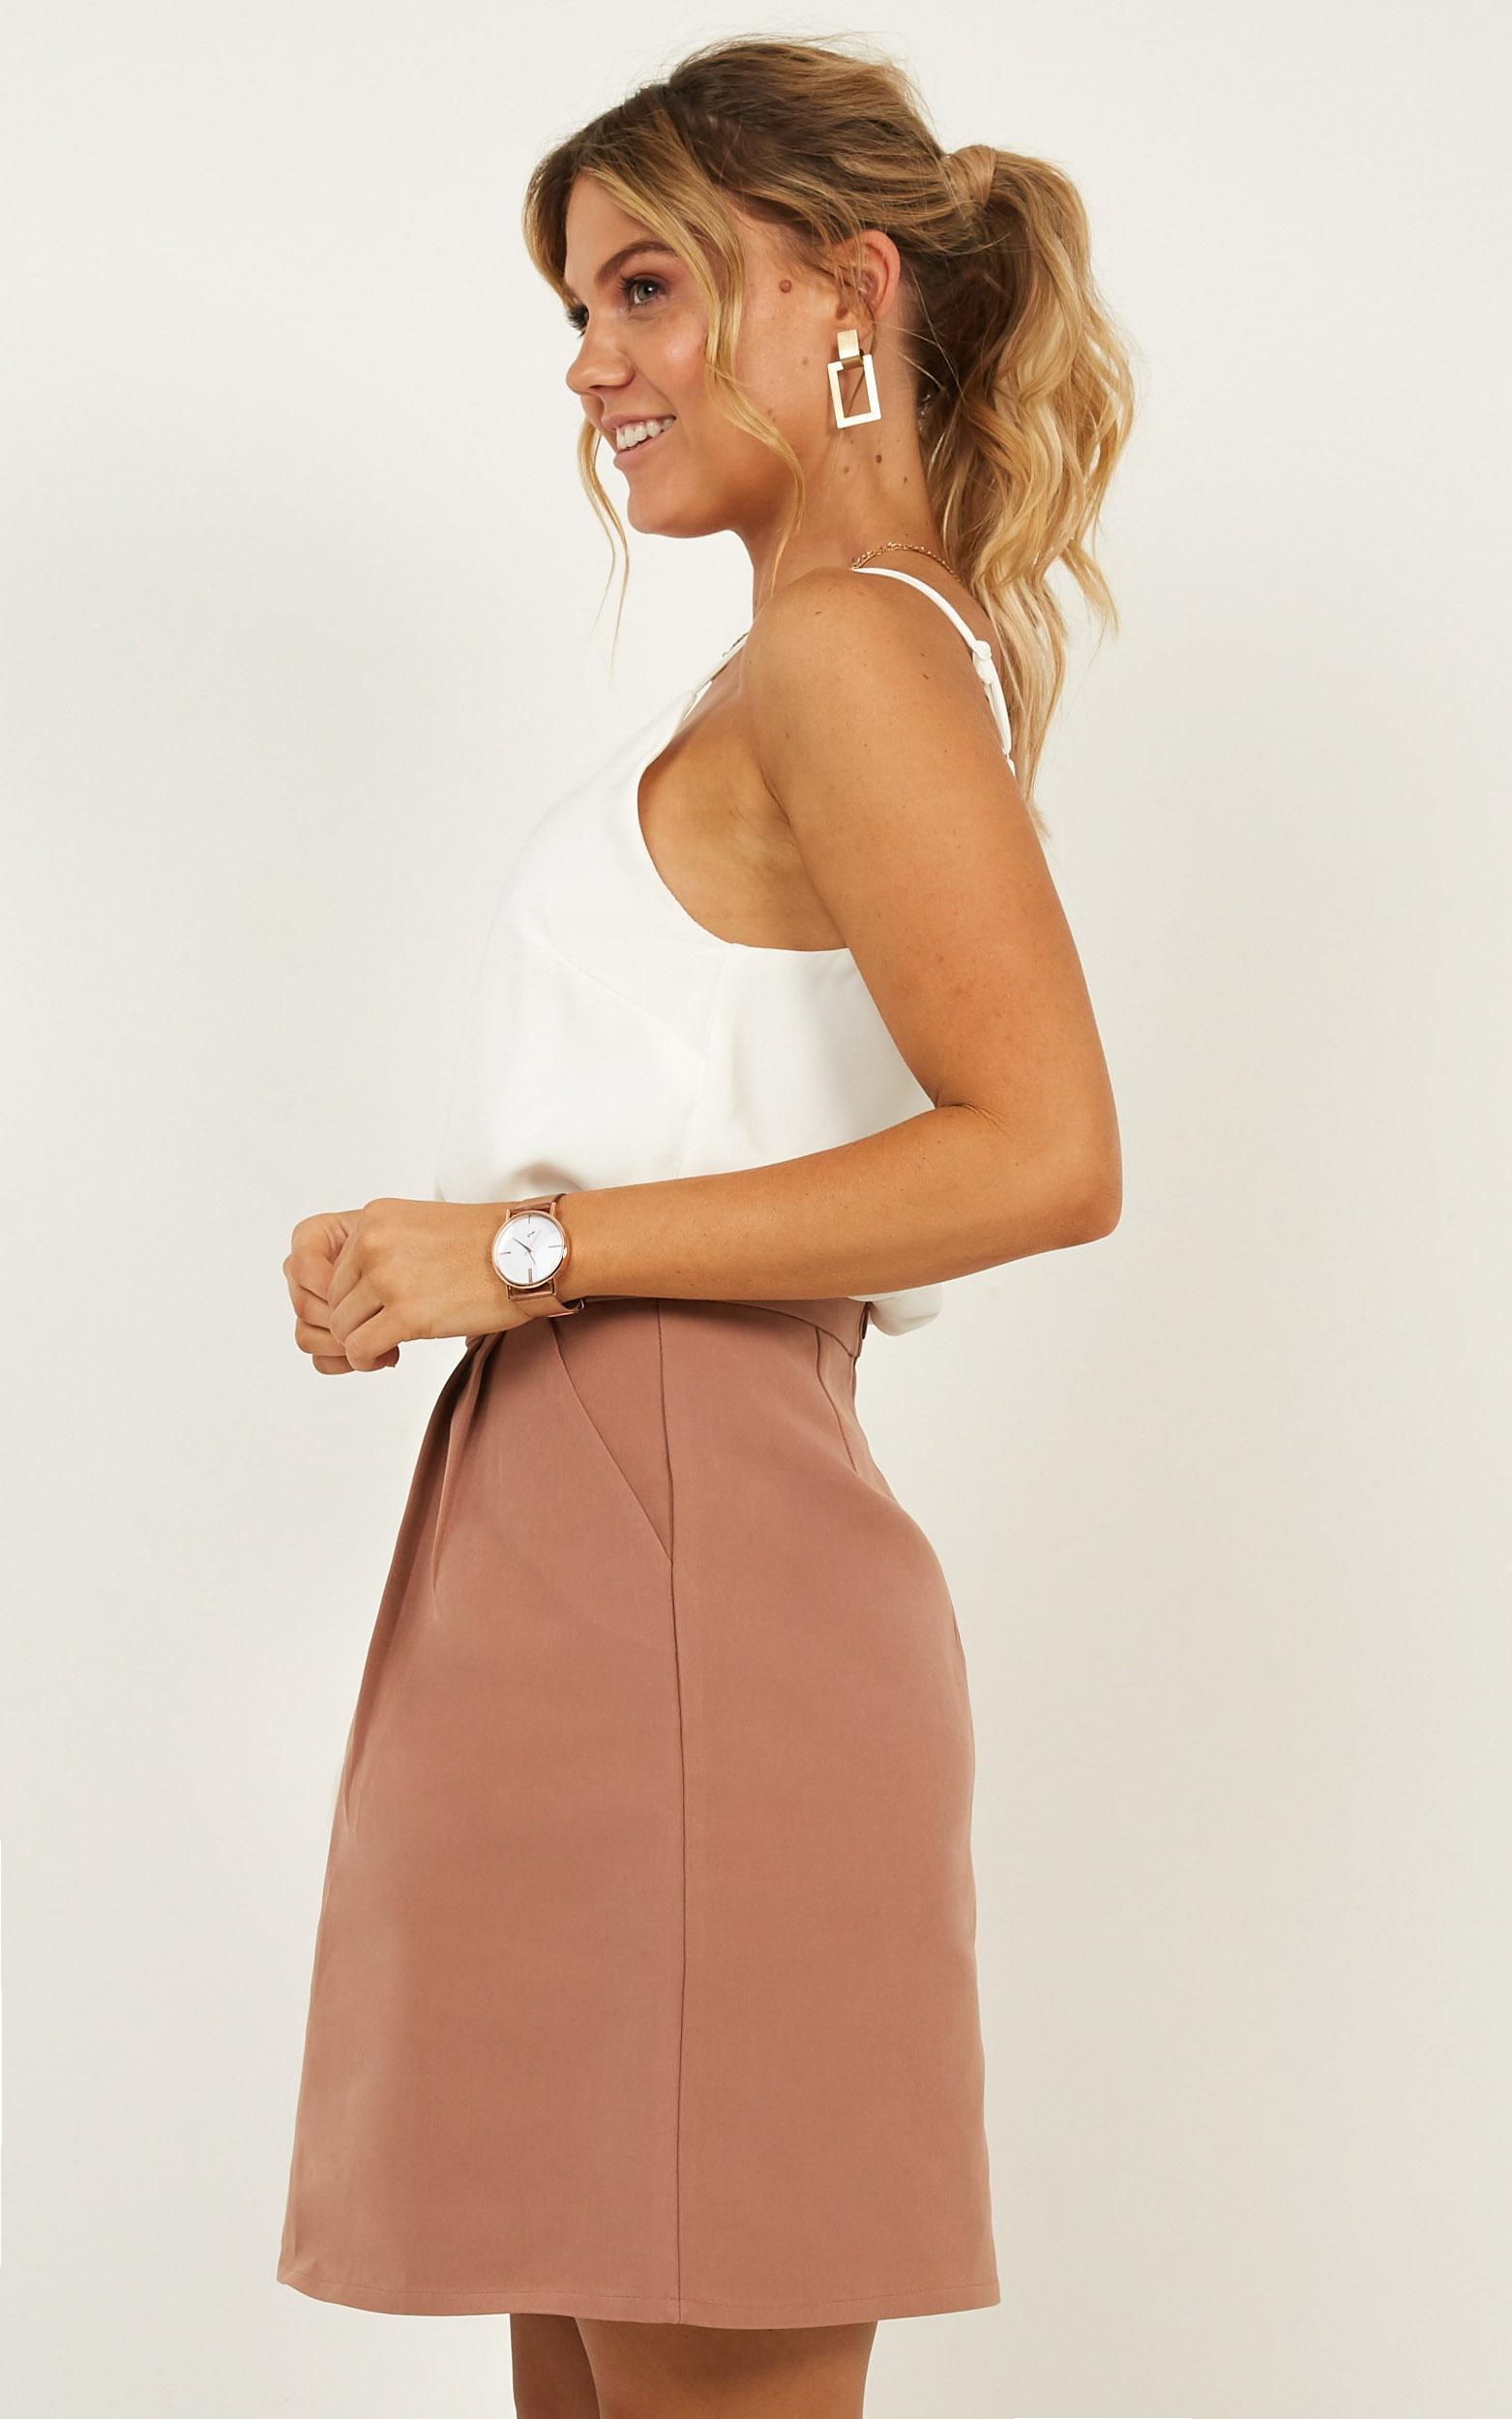 Crunch Time Skirt in dark mocha - 20 (XXXXL), Mocha, hi-res image number null